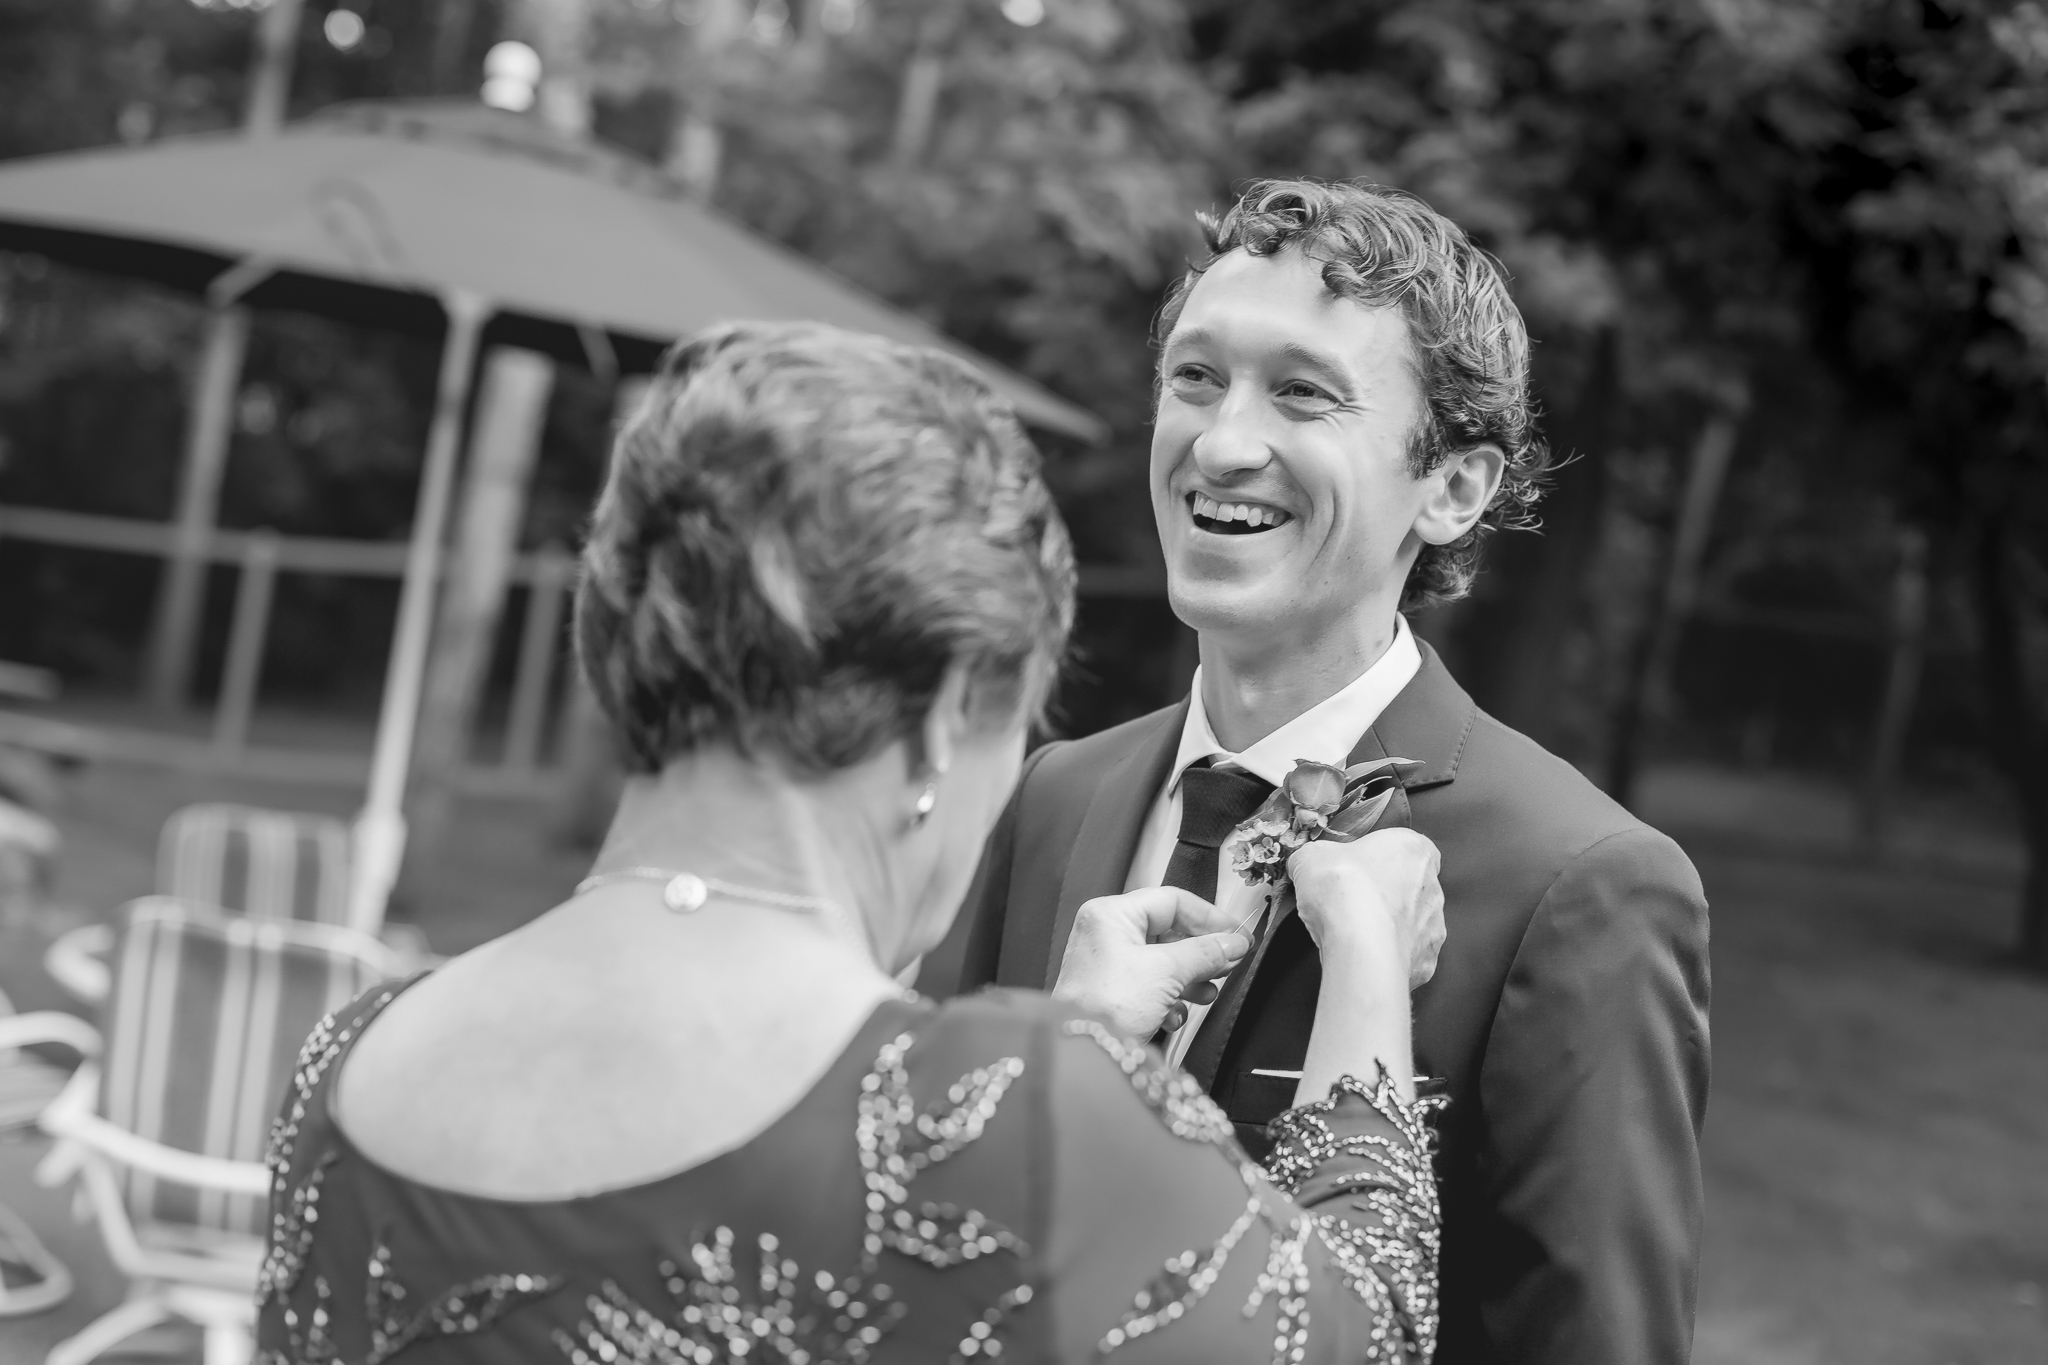 james j hill library wedding photography-4.jpg